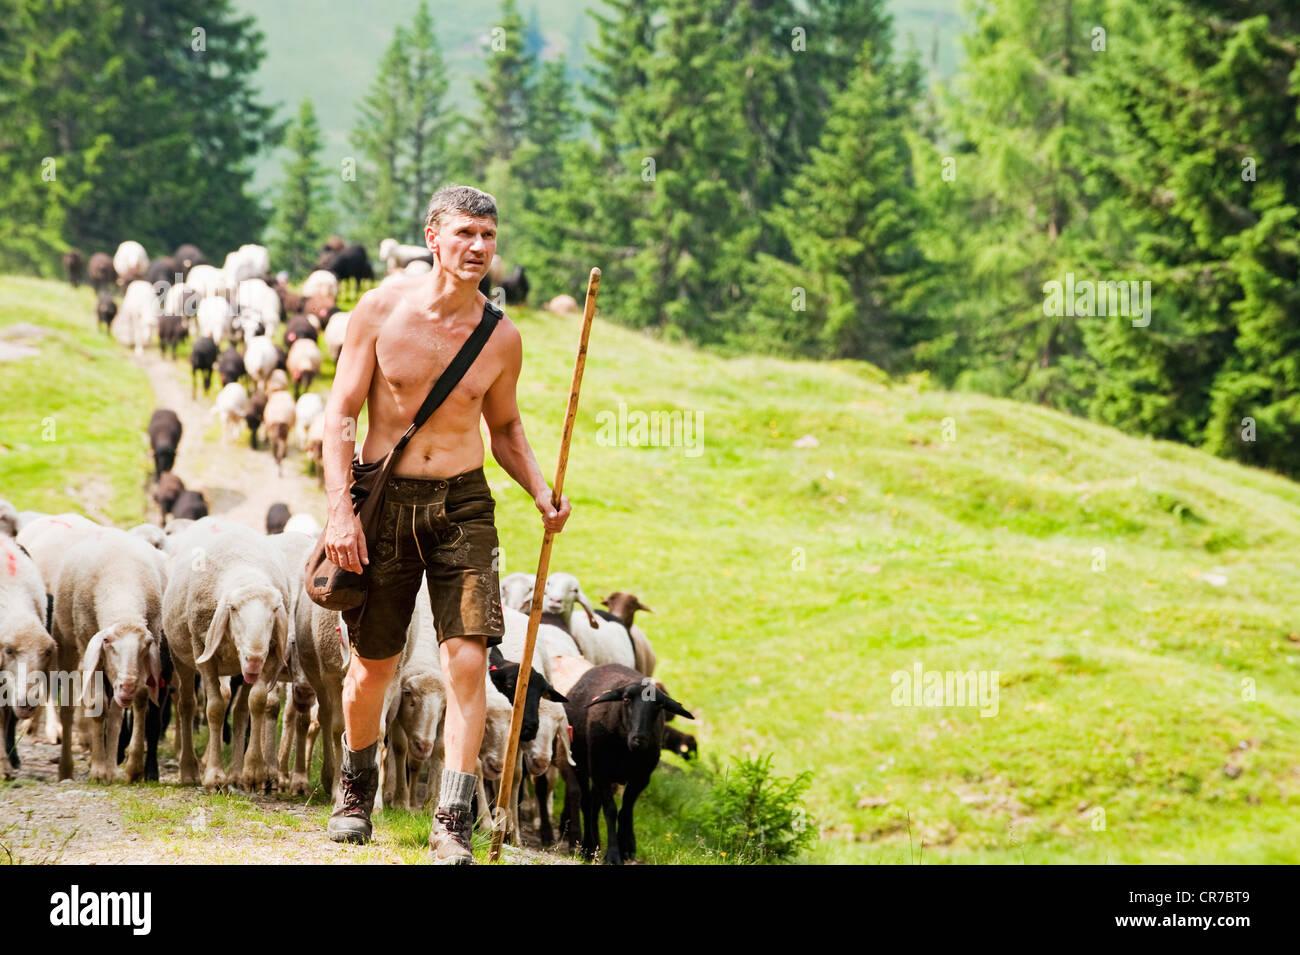 Austria, Salzburg County, Shepherd herding sheep on mountain - Stock Image